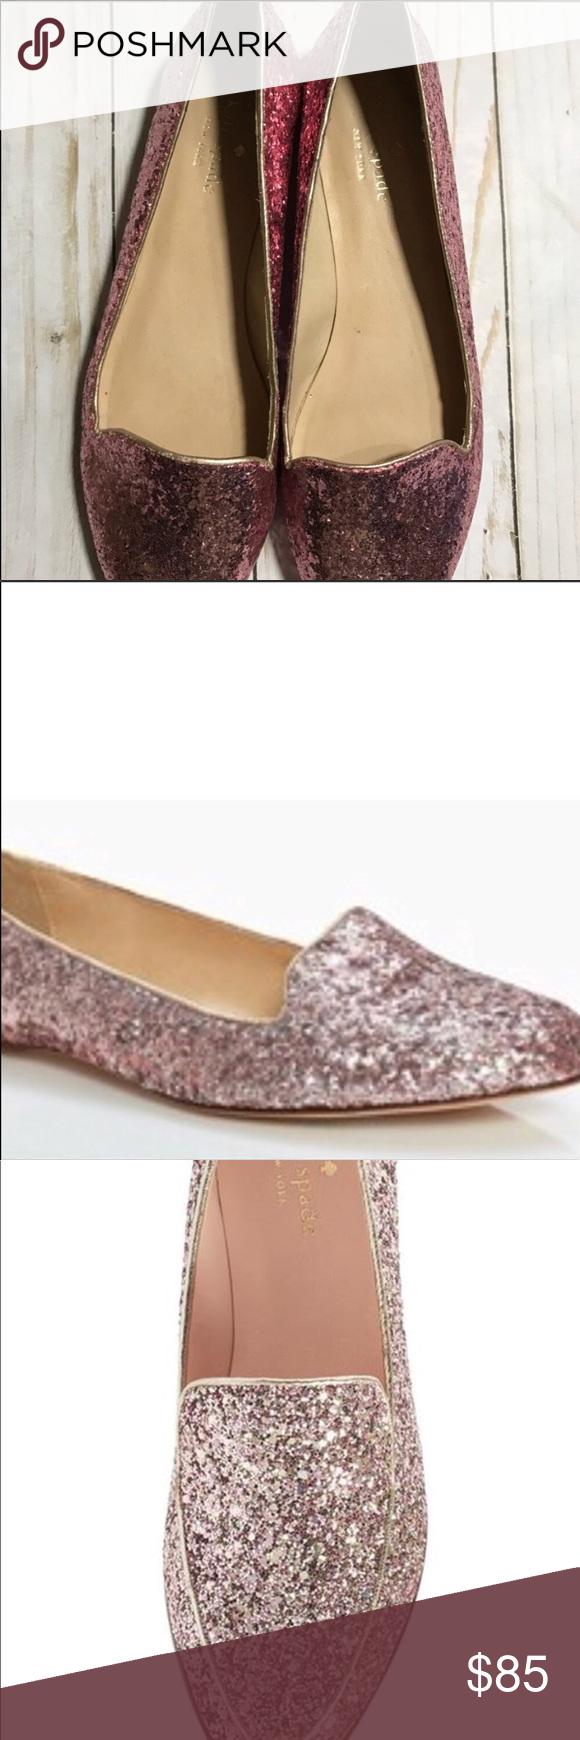 Kate Spade Glitter Loafers | Kate spade